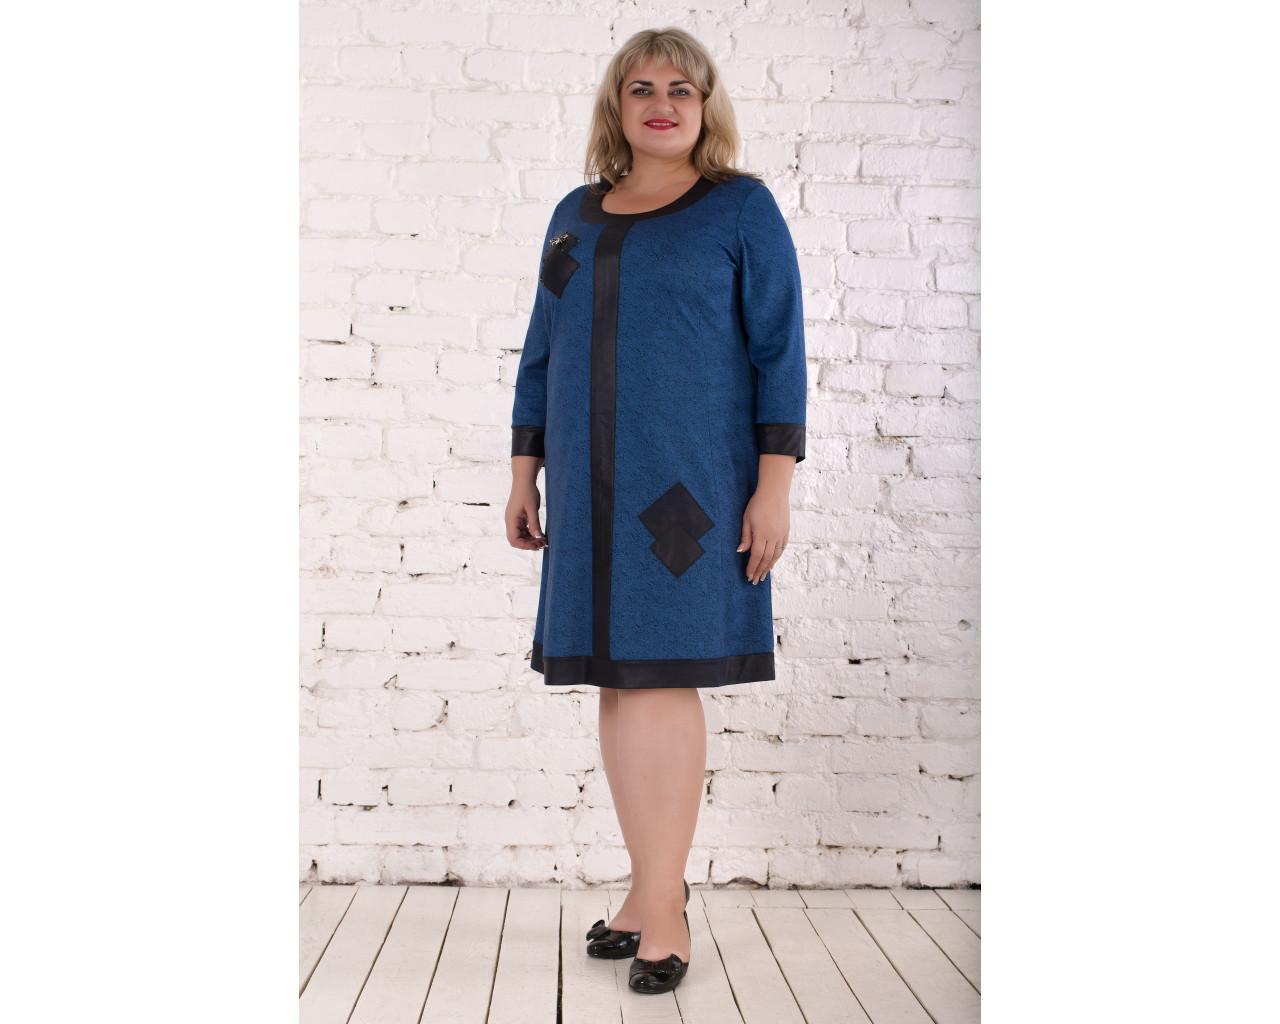 ae7b2ee54962aea Платье Паола 58-66 джинс, цена 645 грн., купить в Харькове — Prom.ua  (ID#766157442)